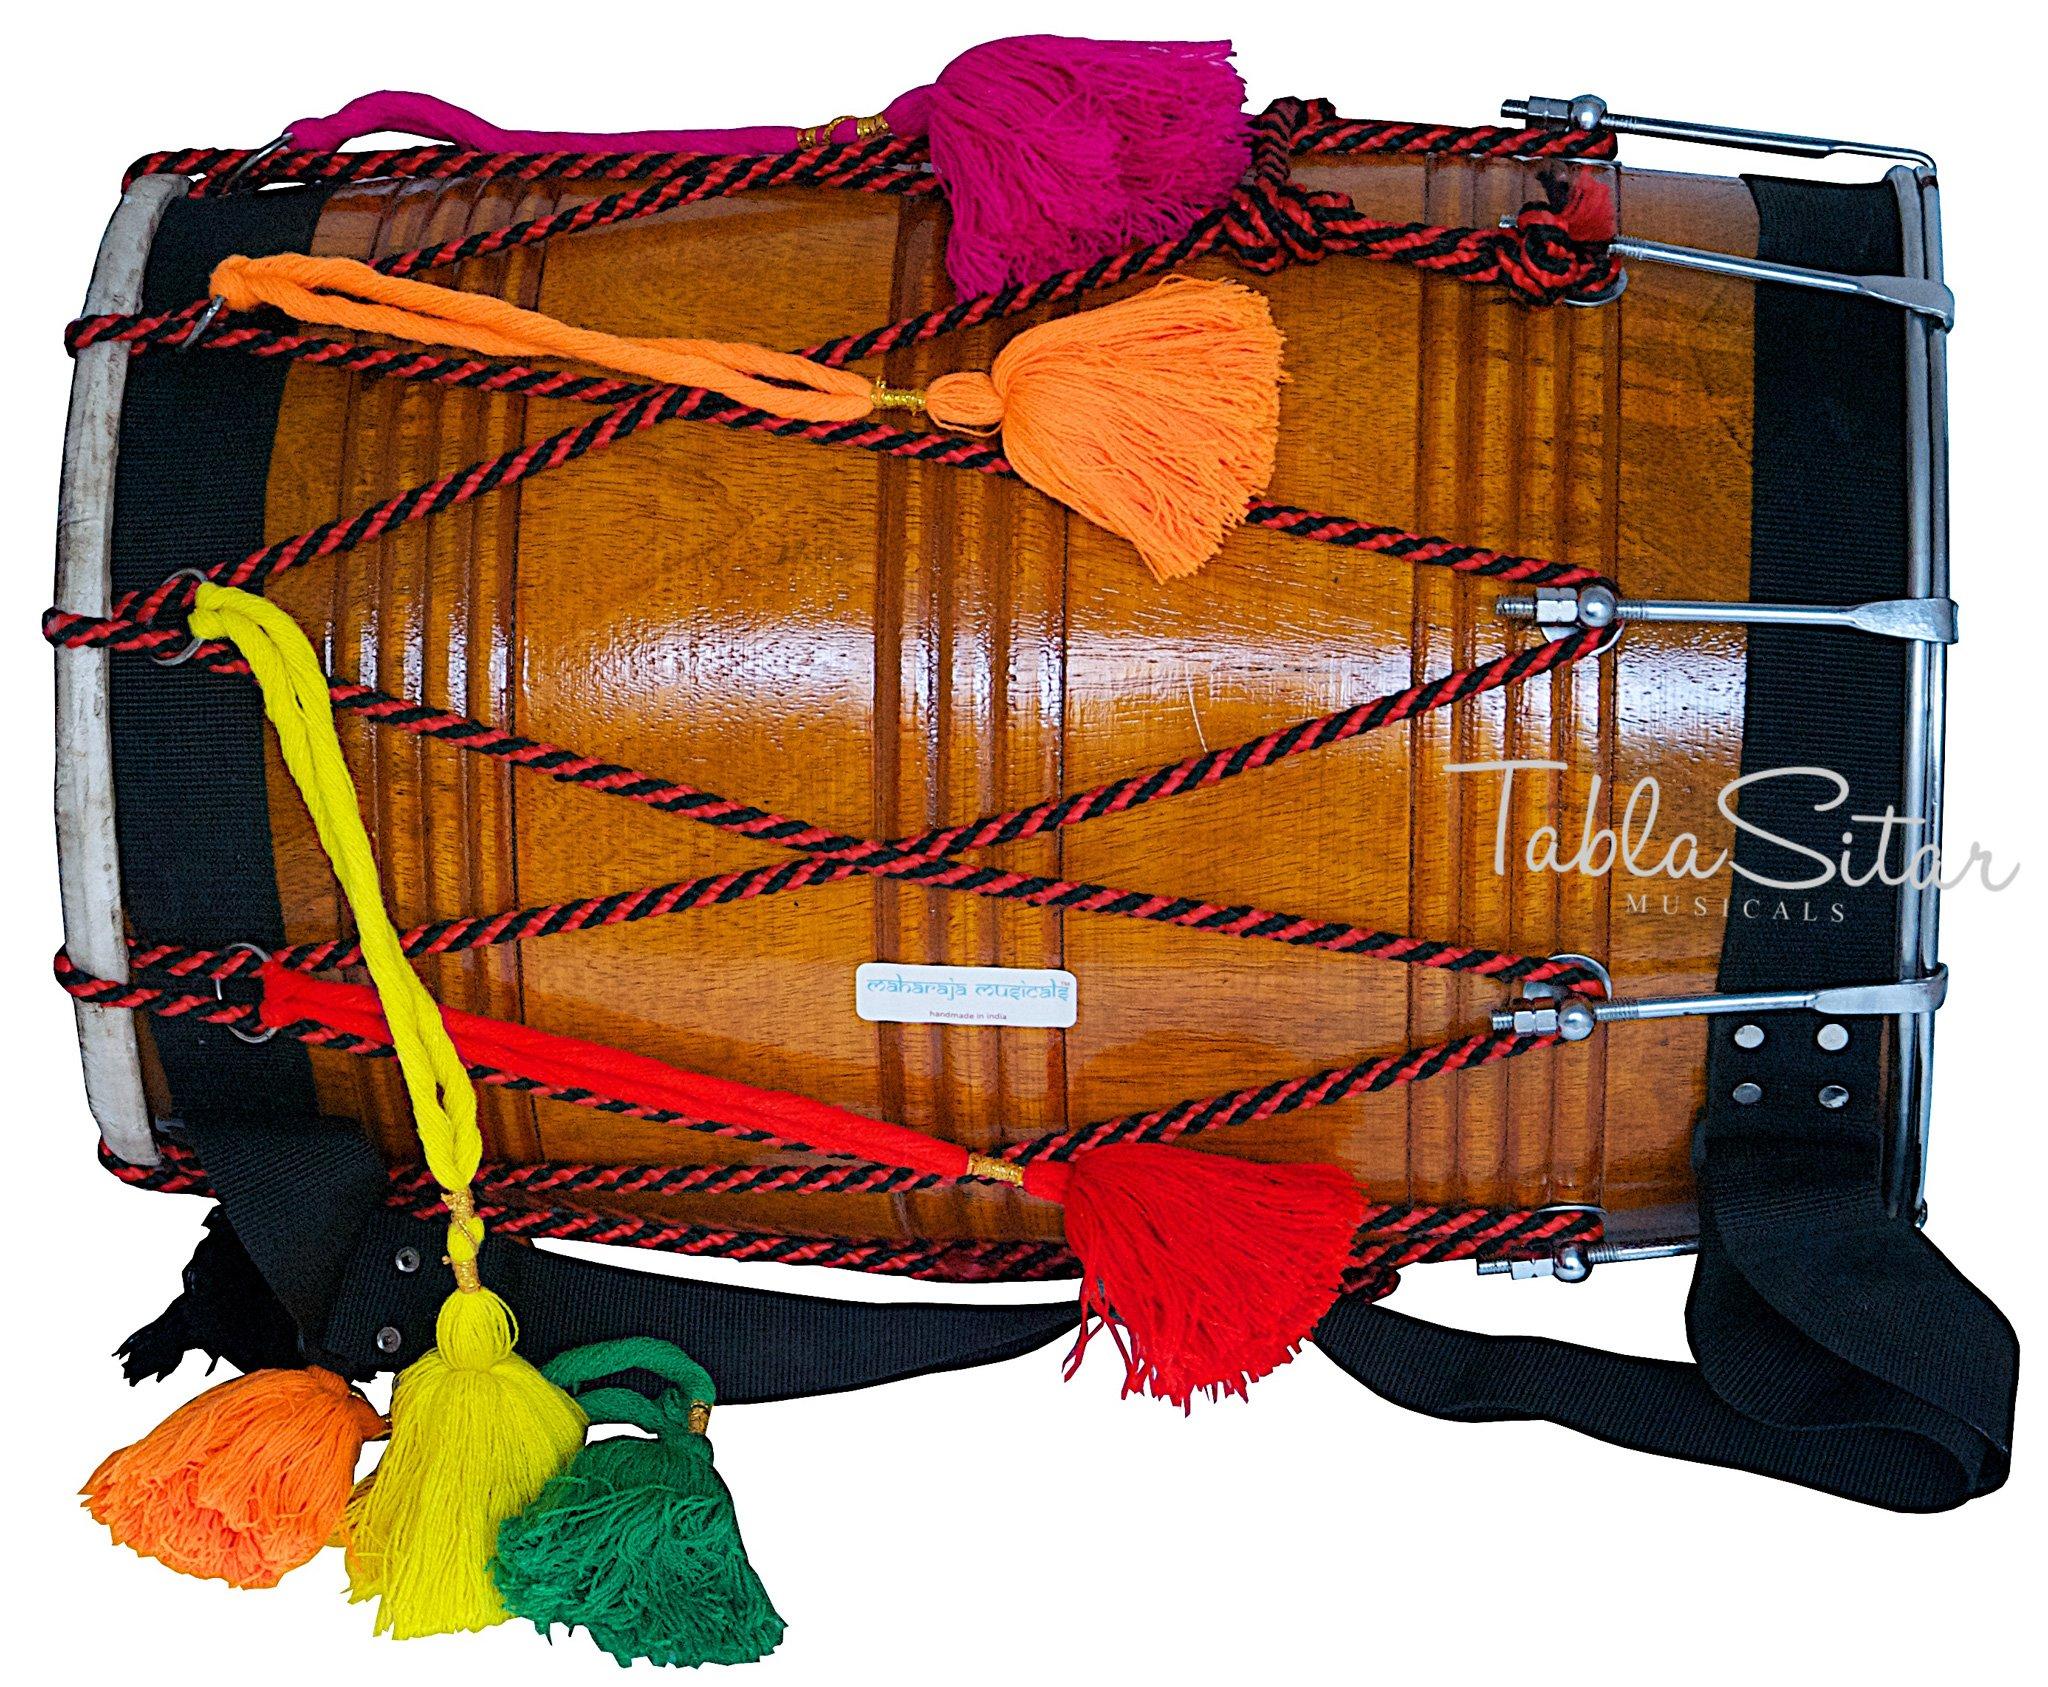 Dhol Drum by Maharaja Musicals, Mango Wood, Natural, Barrel Shaped, Padded Bag, Beaters, Nylon Shoulder Strap, Punjabi Bhangra Dhol Musical Instrument (PDI-GE) by Maharaja Musicals